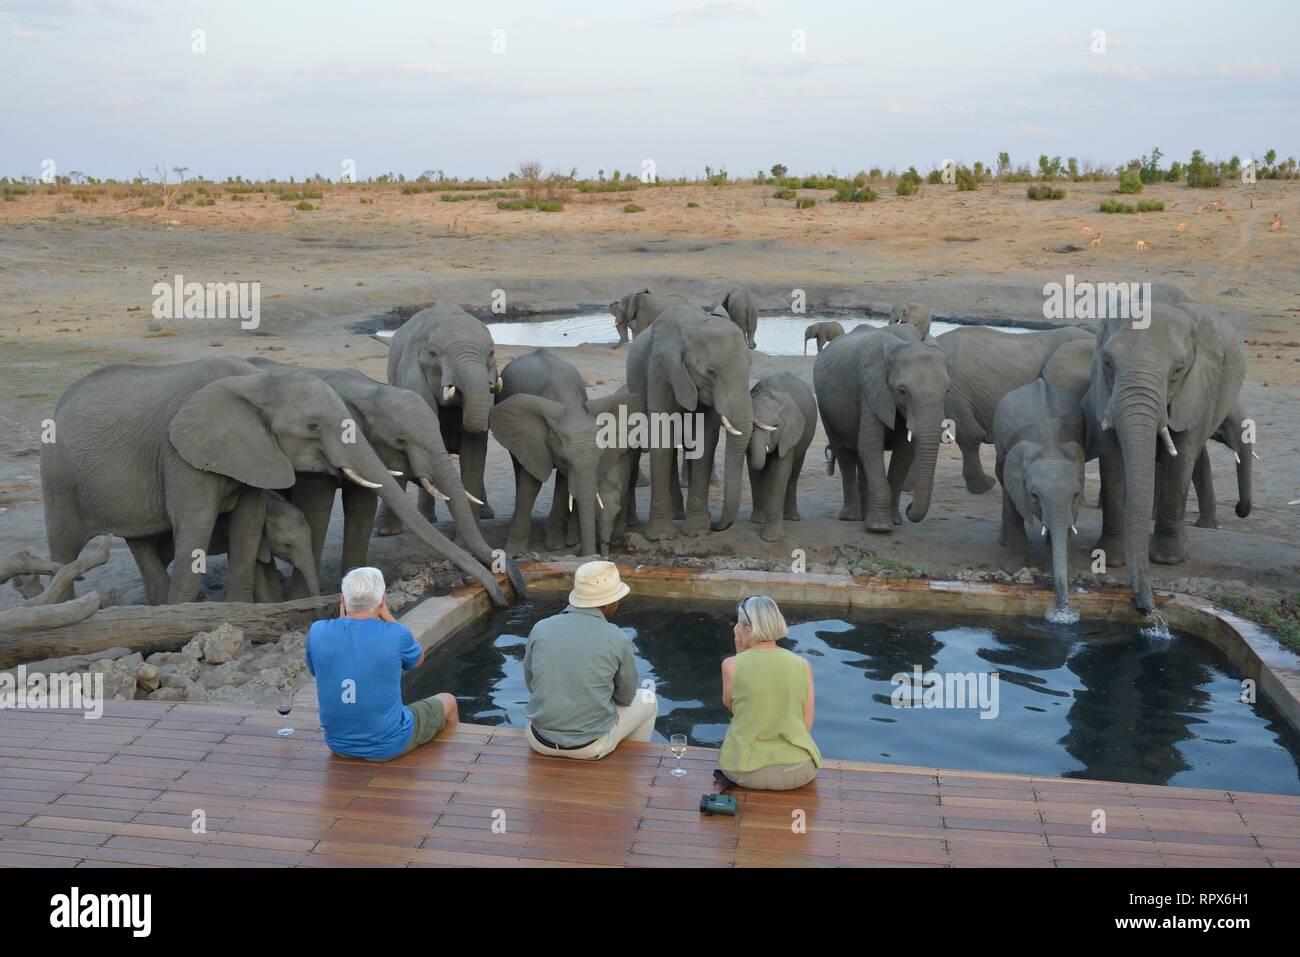 zoology, mammal (mammalia), tourists observe elephant (Loxodonta africana), Somalisa camp, Hwange Nati, Additional-Rights-Clearance-Info-Not-Available - Stock Image